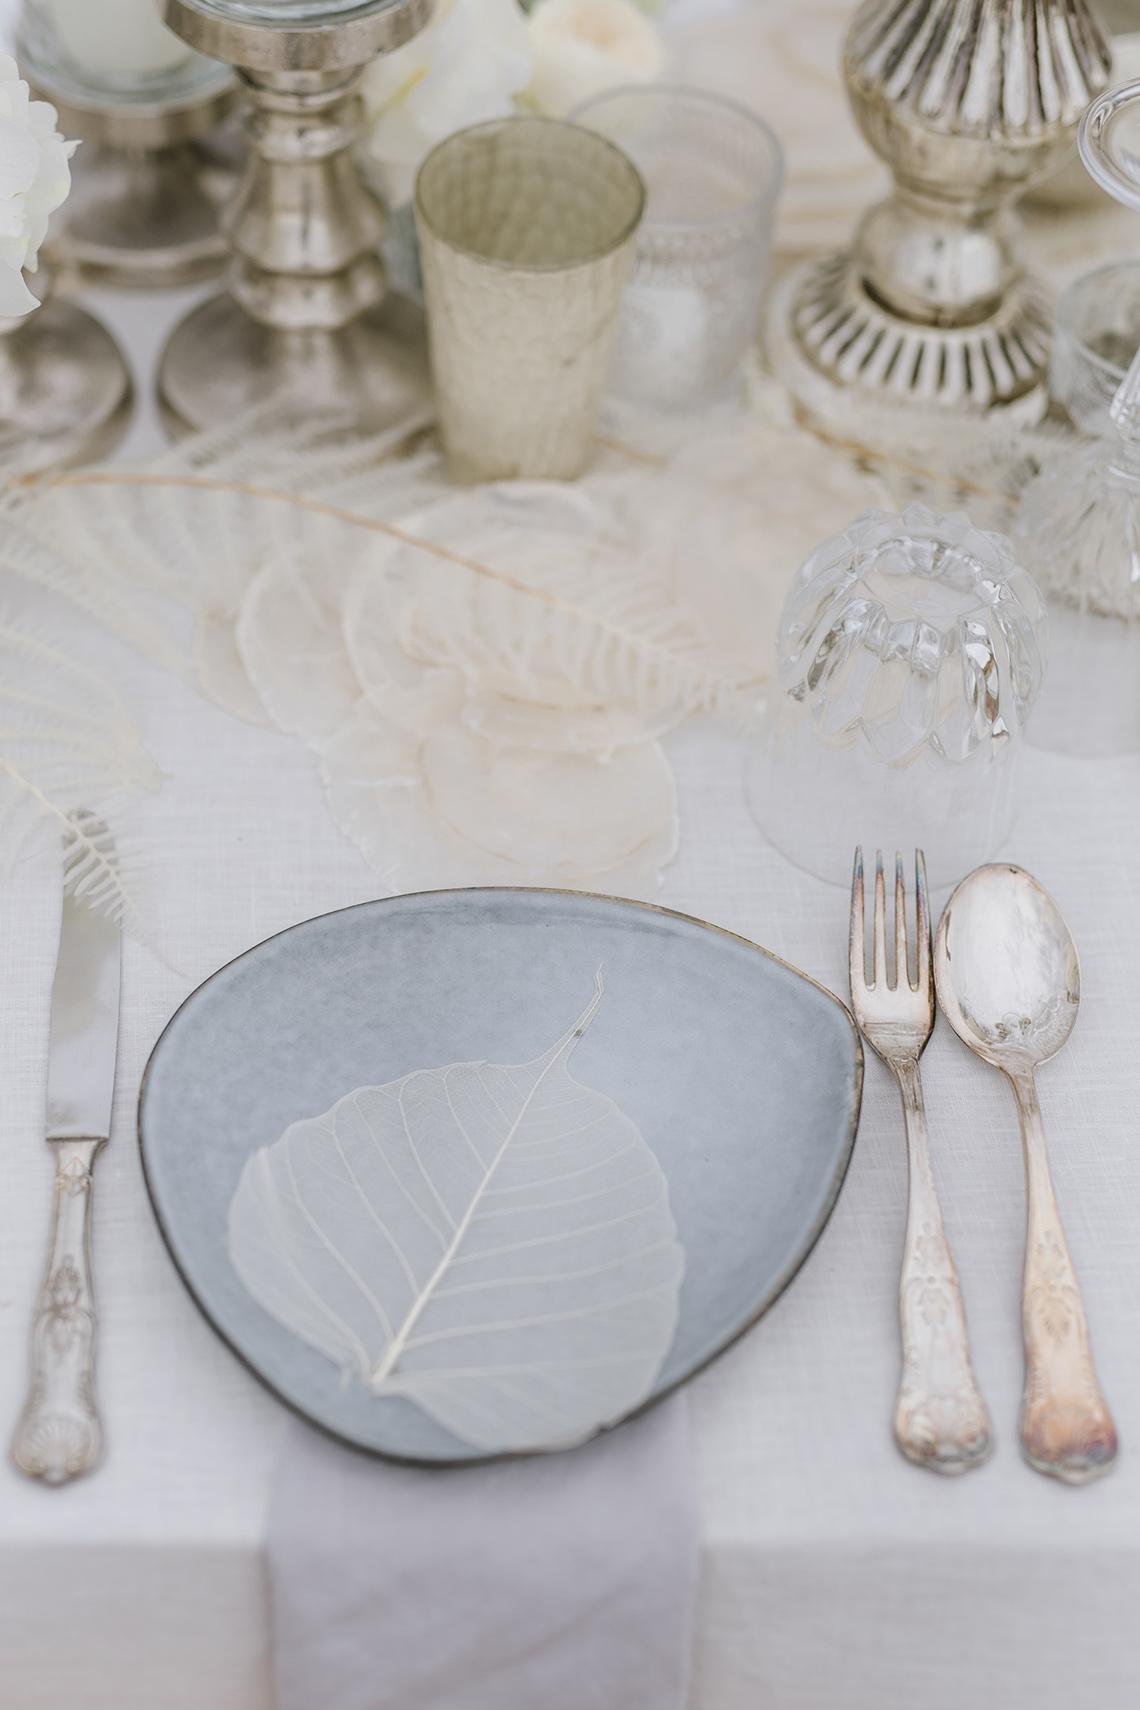 Couture Wedding Inspiration from the Beaches of Apulia – Le Velo Fotografia 3